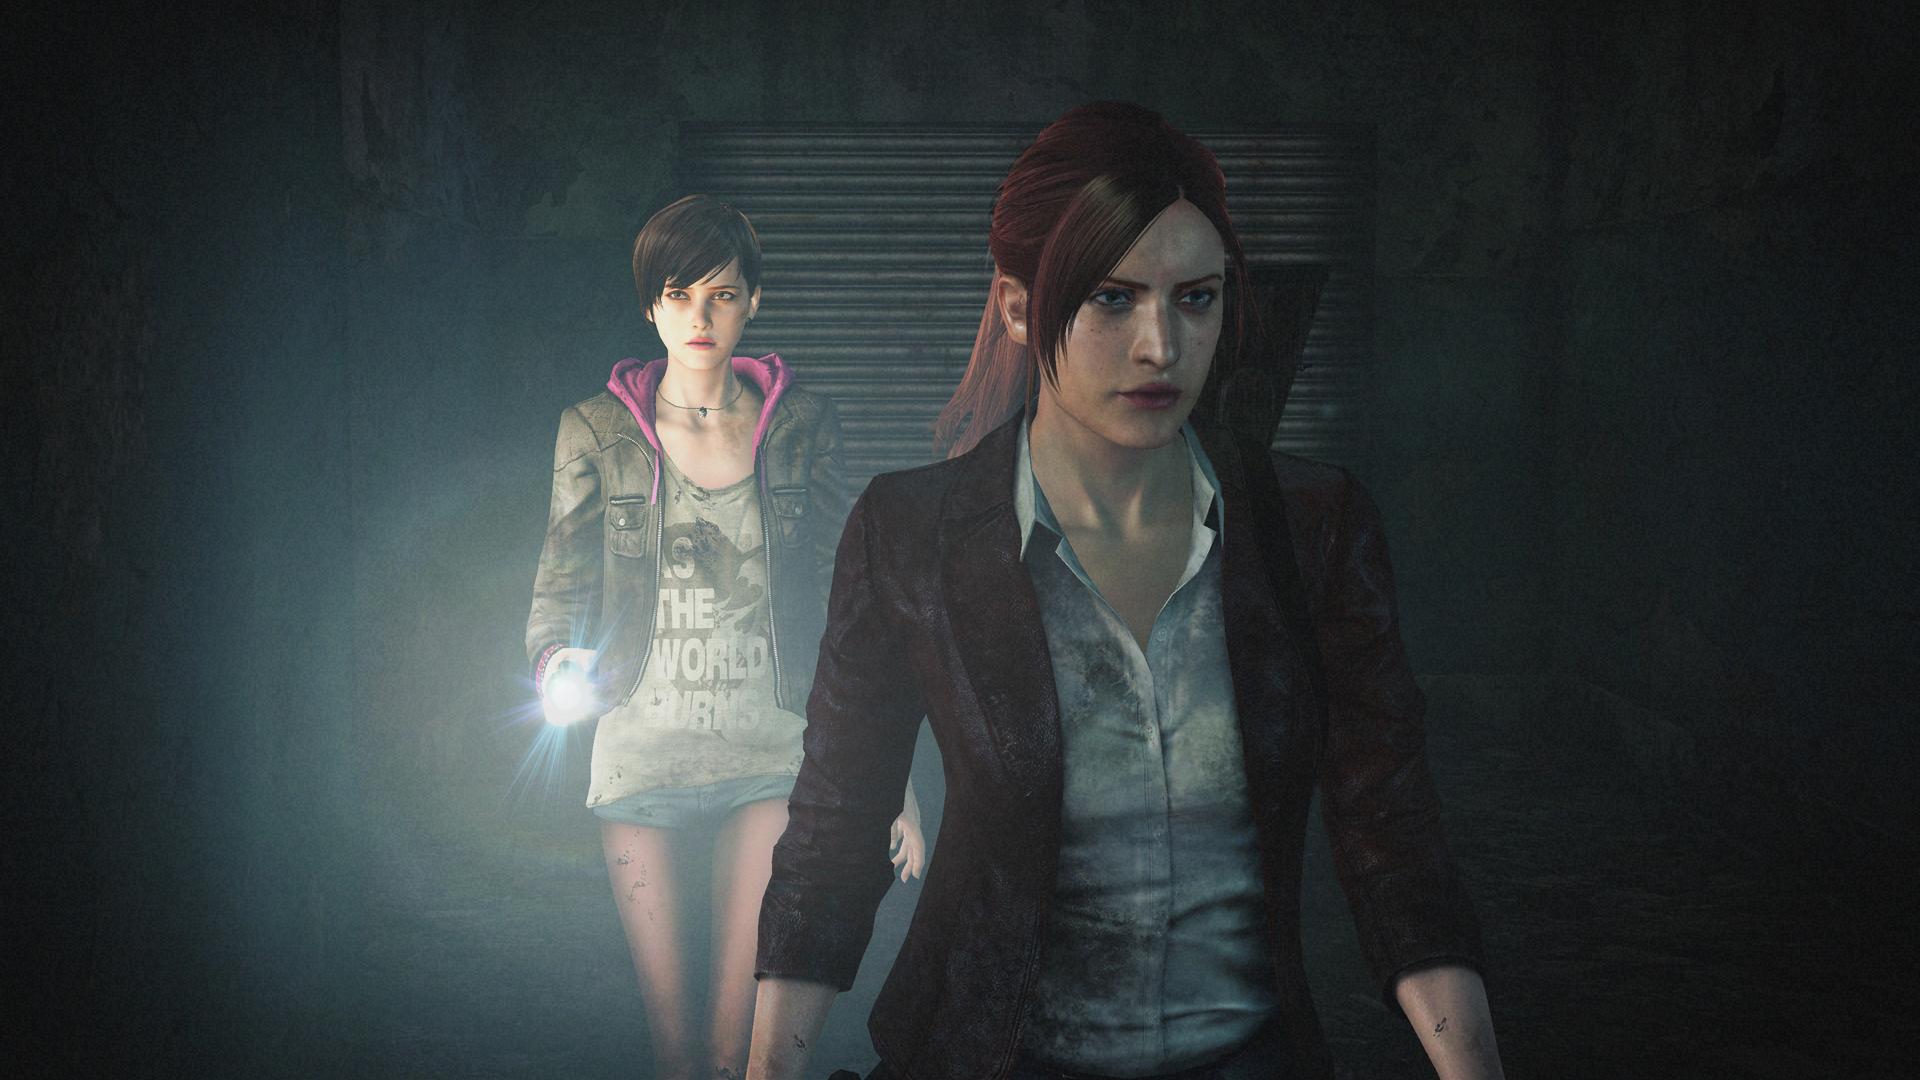 Resident Evil Revelations 2 / Biohazard Revelations 2 Ss_bb0414dcd697a834a5f5187376c4ab0eff22d77c